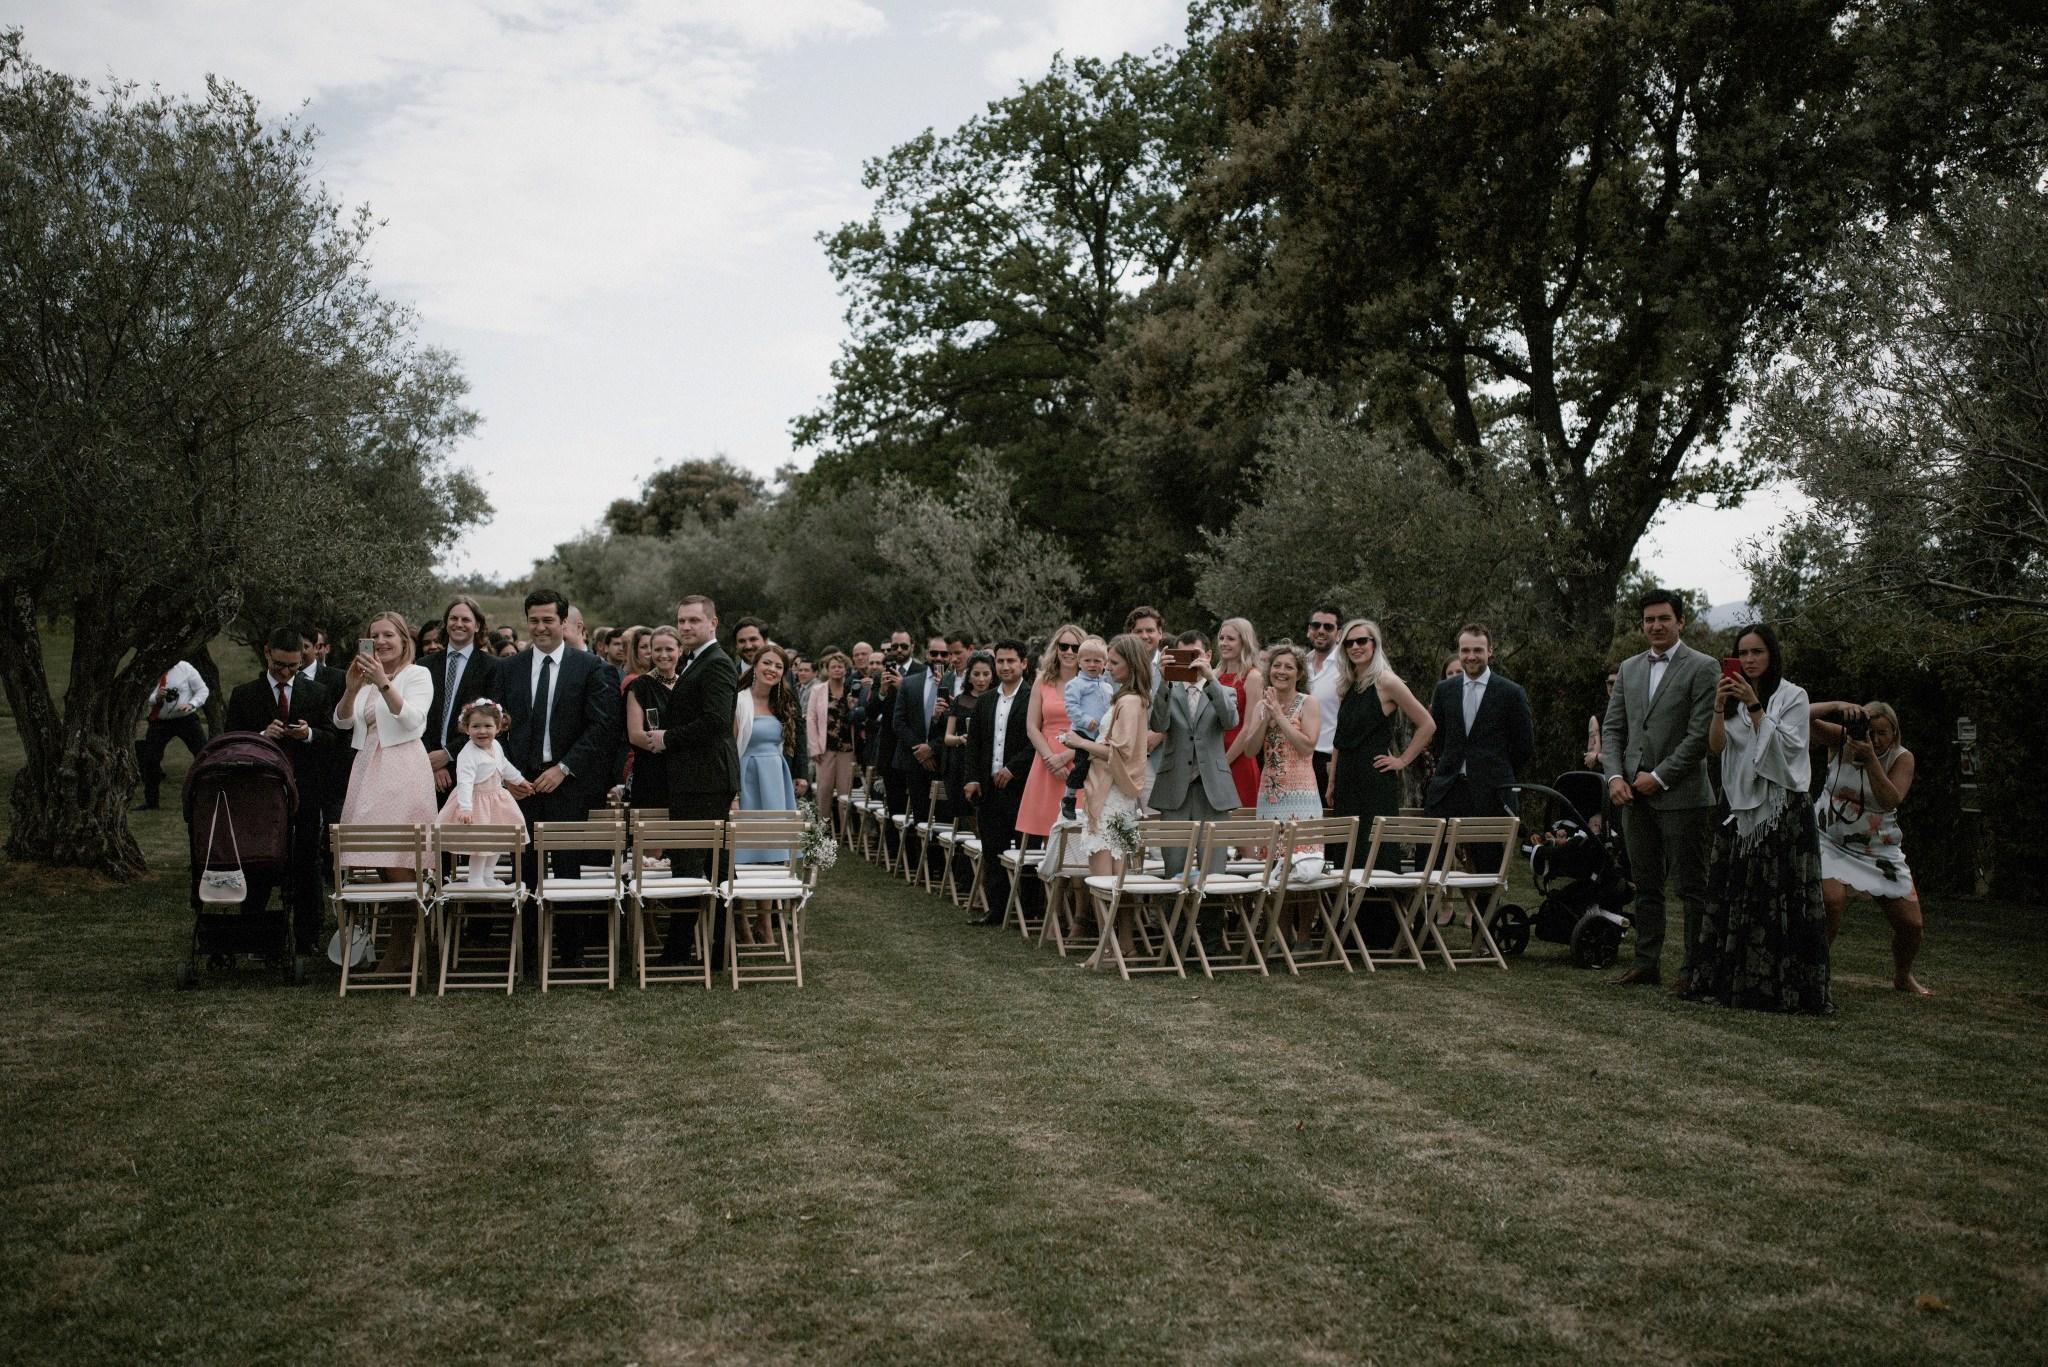 Bruidsfotograaf Spanje Castle d'Emporda destination wedding Naomi van der Kraan00028.jpg